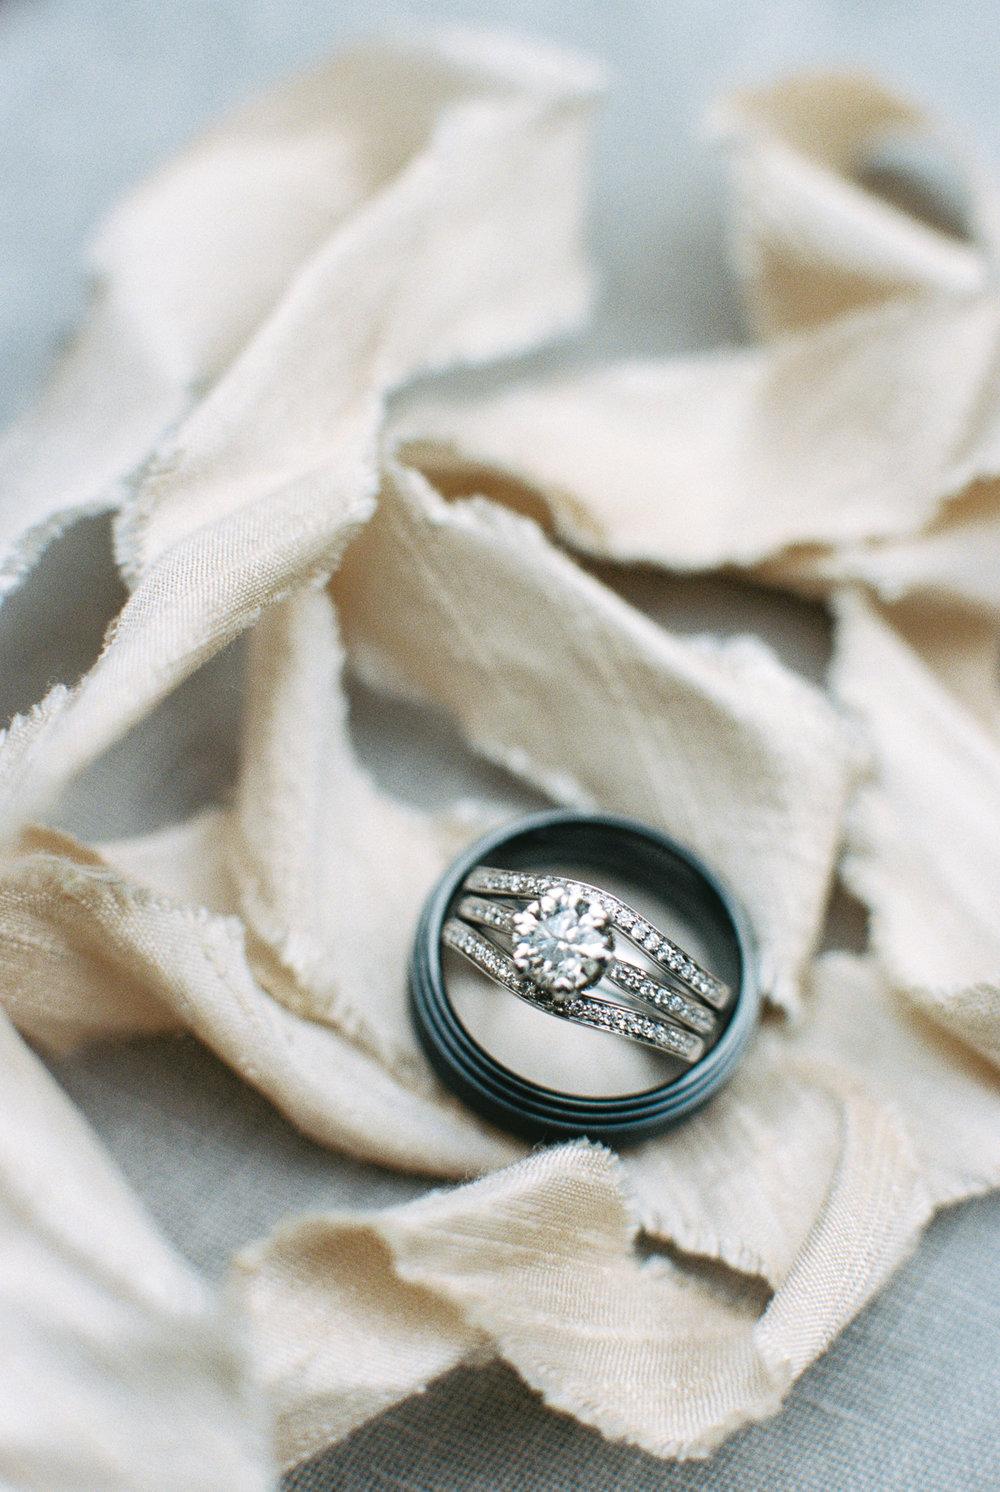 web casey + alec wren's nest film wedding photographers ©2016abigailbobophotography-8.jpg